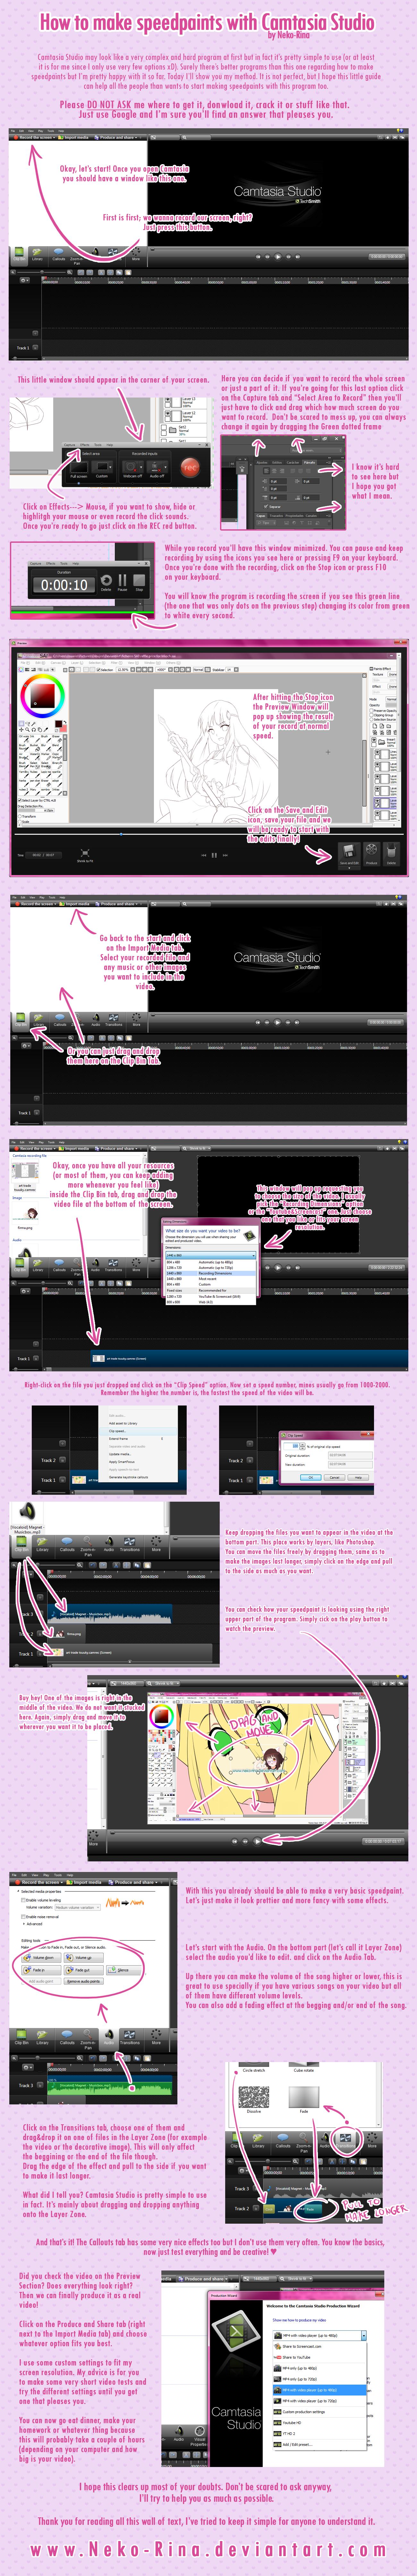 How to make speedpaints with Camtasia Studio